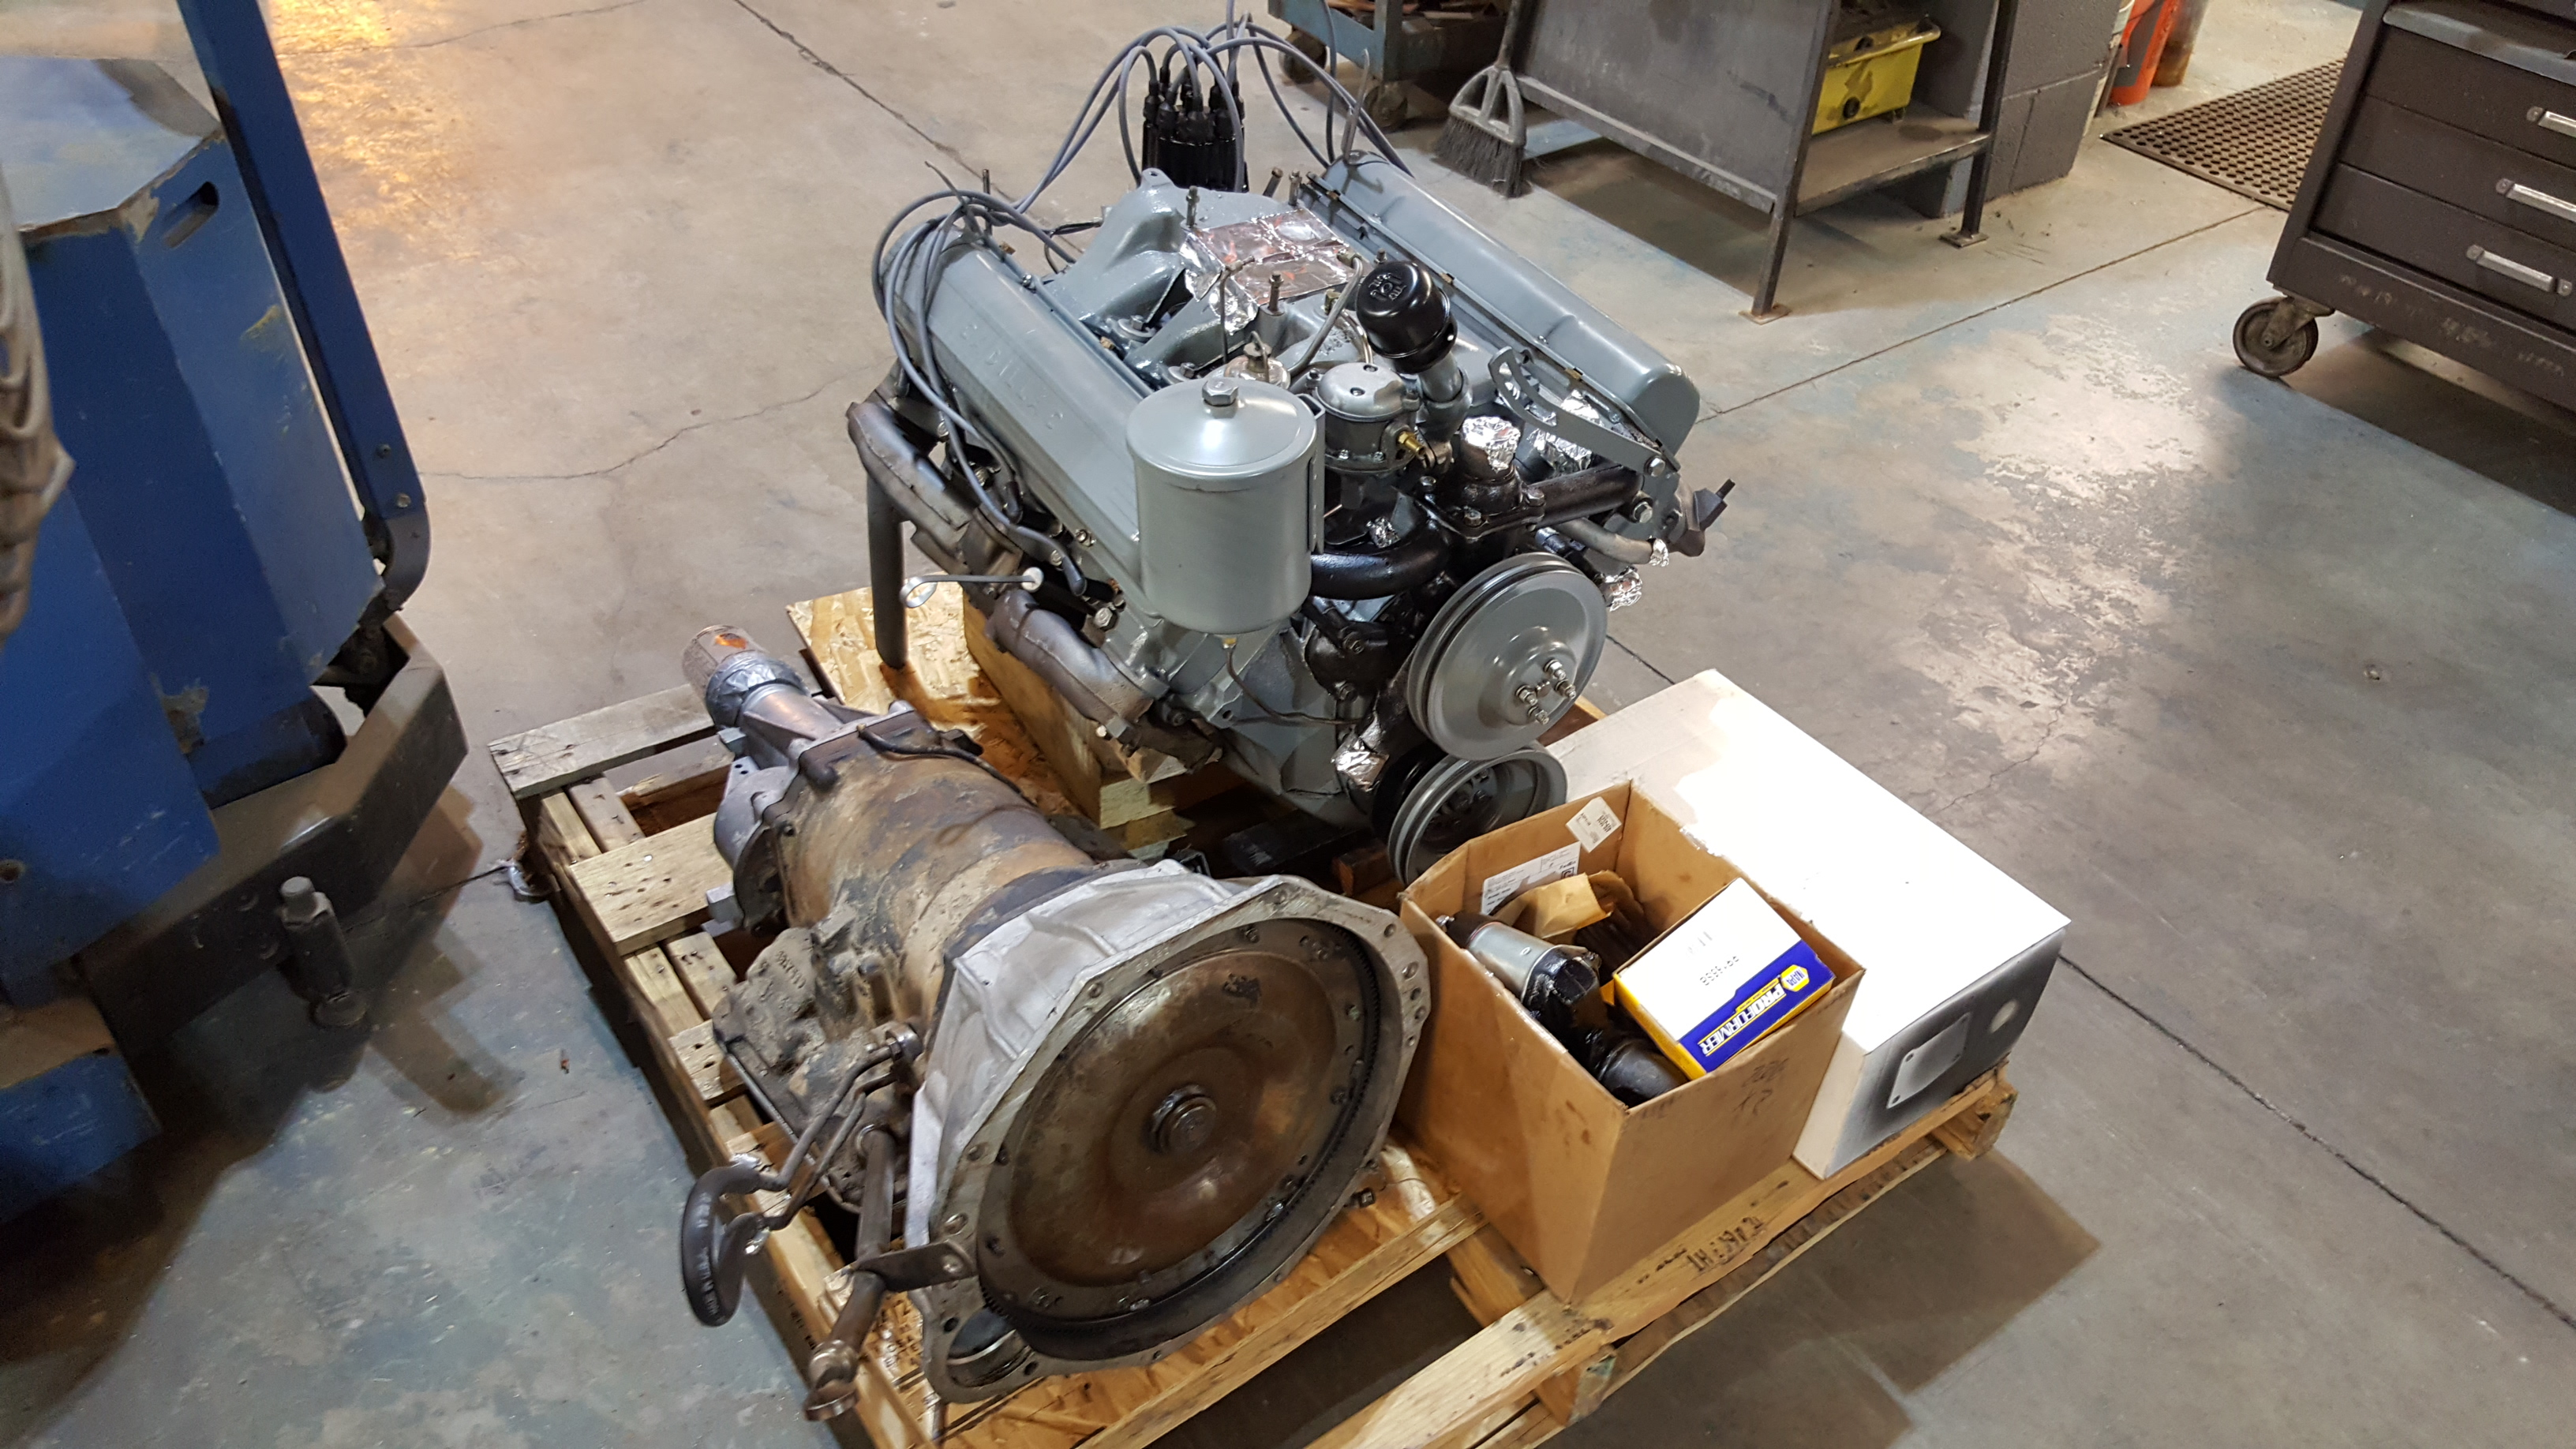 1957 Cadillac 365 V8 Engine Rebuild and Restoration - Motor Mission Machine and Radiator